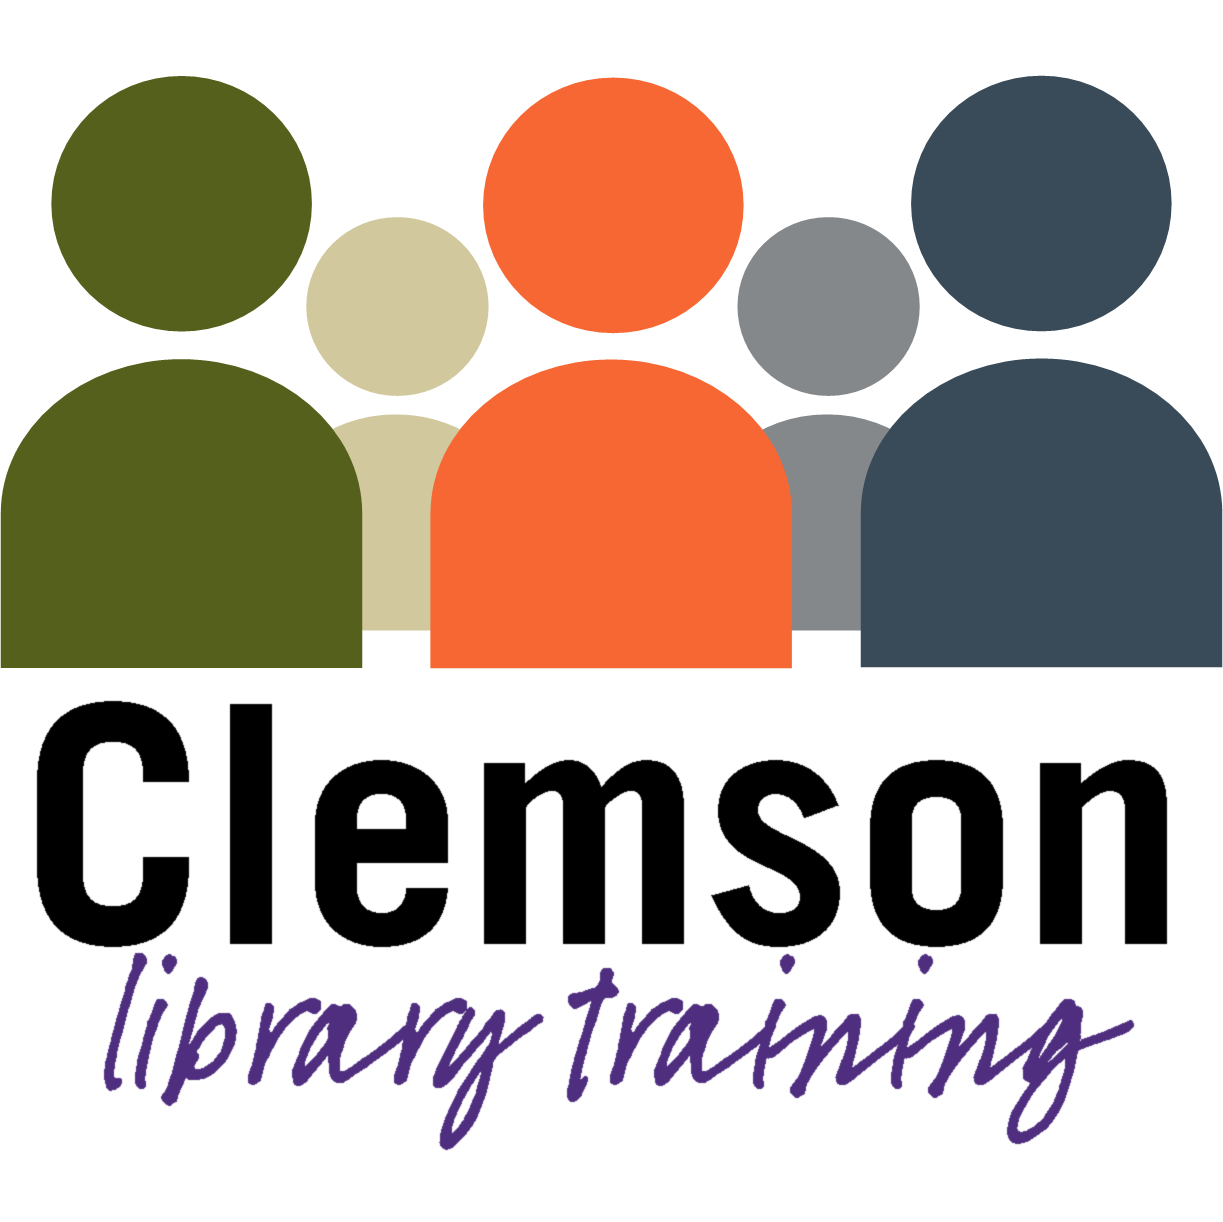 Clemson Library Training logo